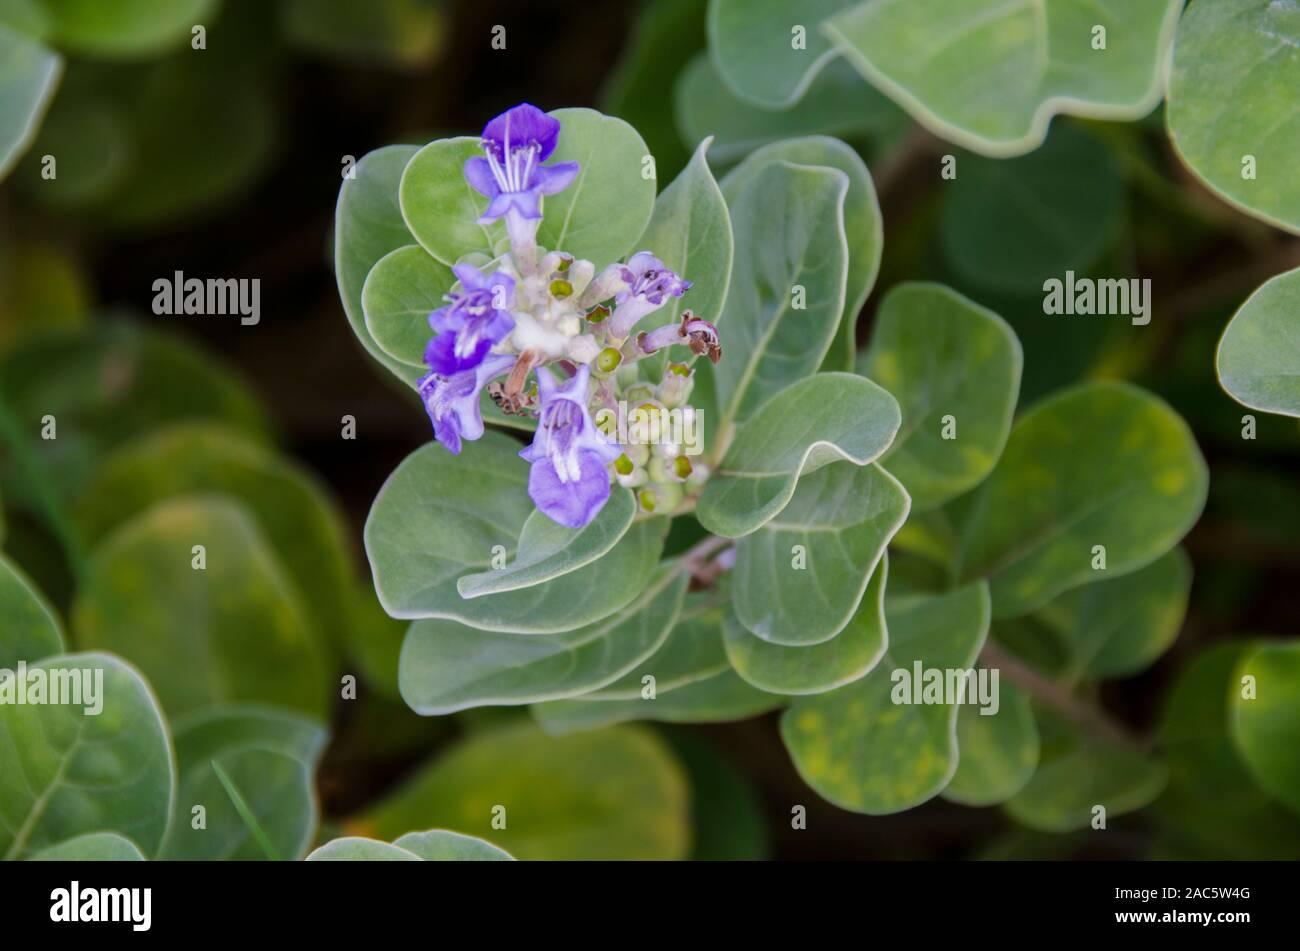 The native Hawaiian plant Pohinahina has bell-shaped flowers with blue violet petals. Stock Photo